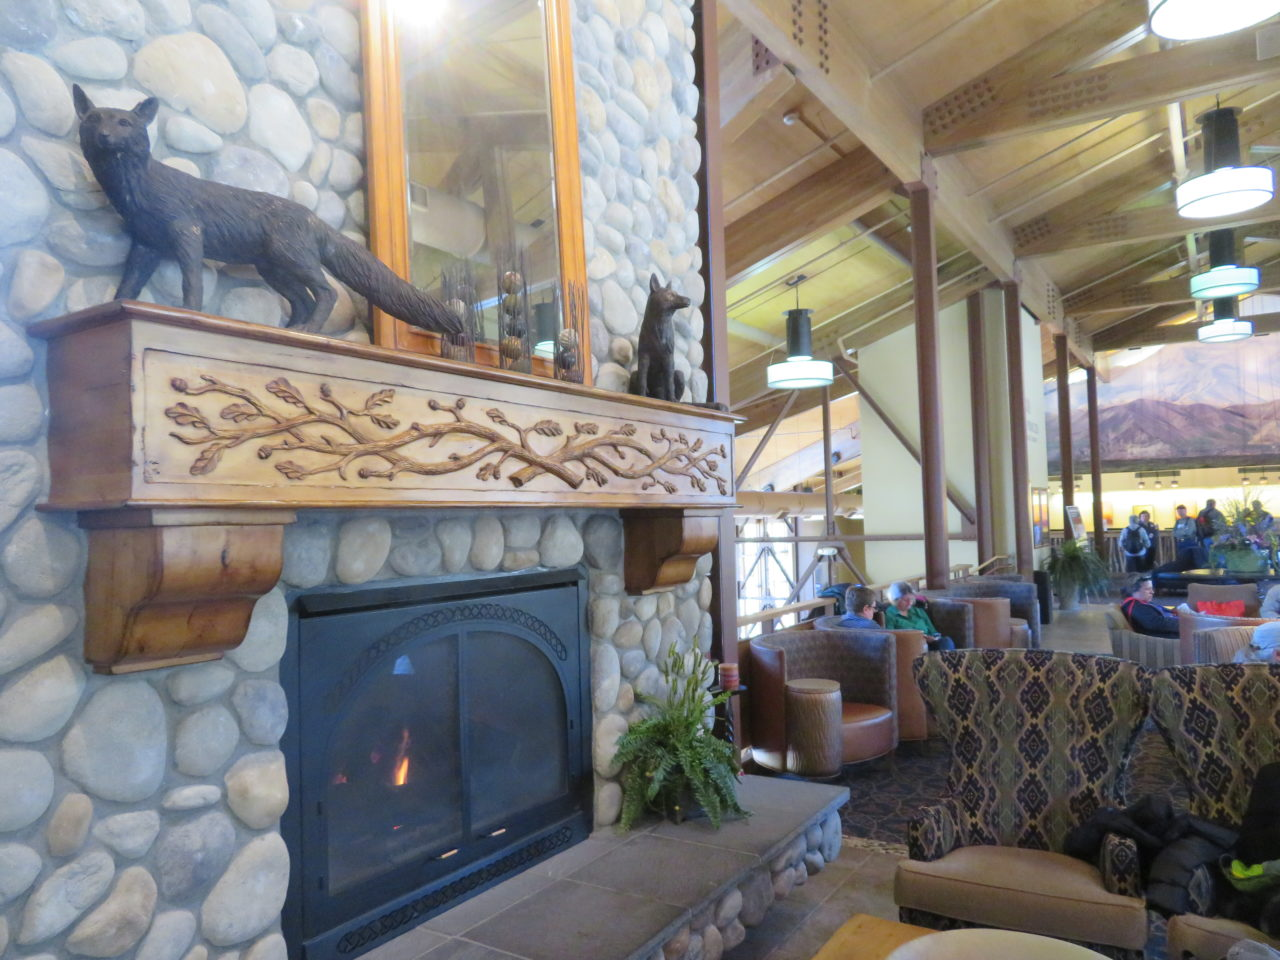 Lobby of the Denali Princess Wilderness Lodge in Alaska